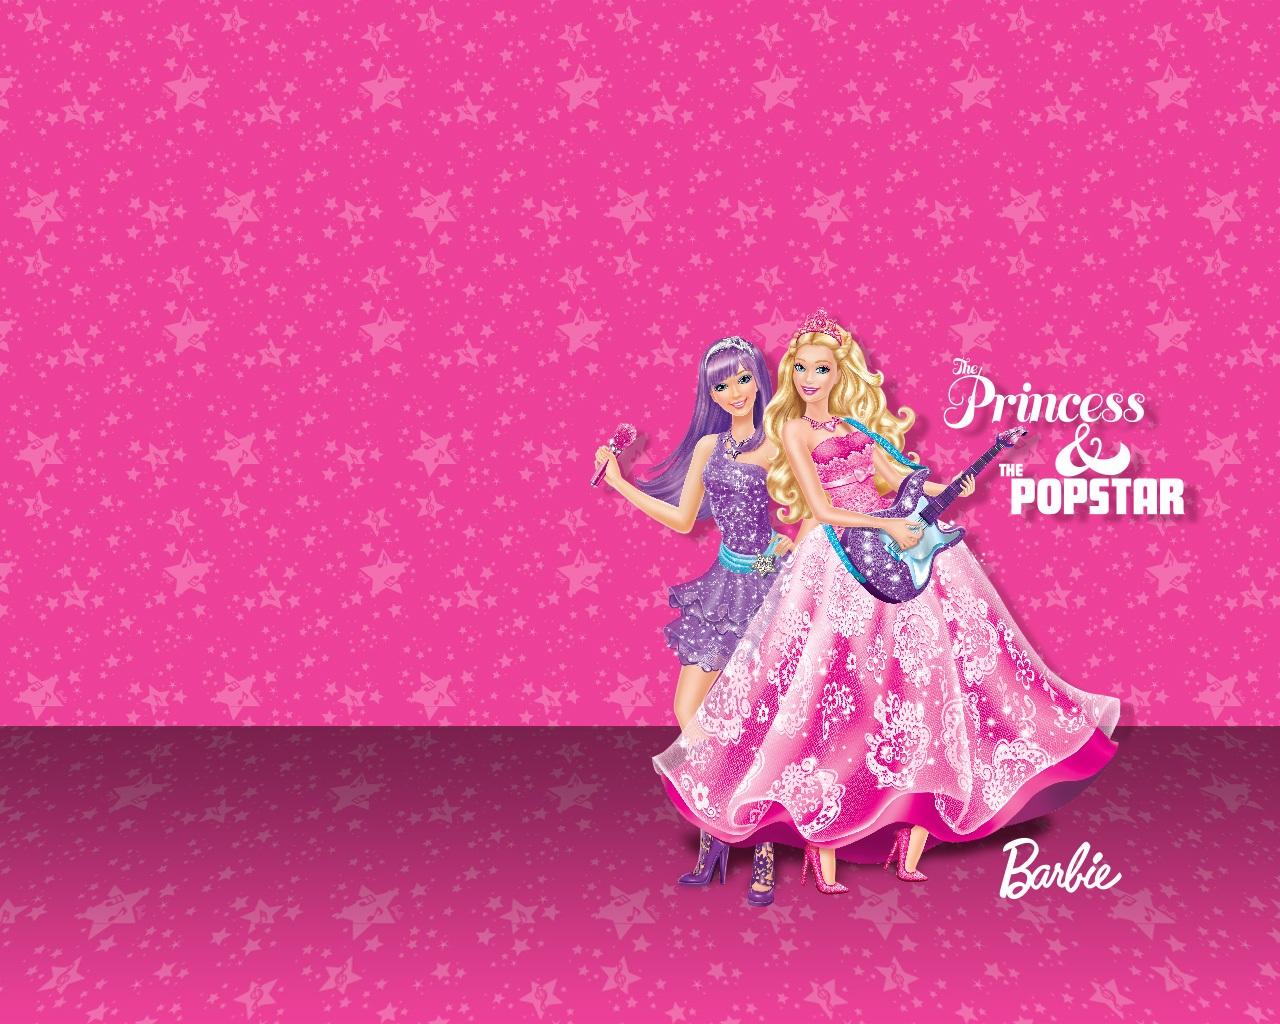 Uncategorized Barbie Pop Star barbie the princess popstargallery movies wiki and popstar wallpaper